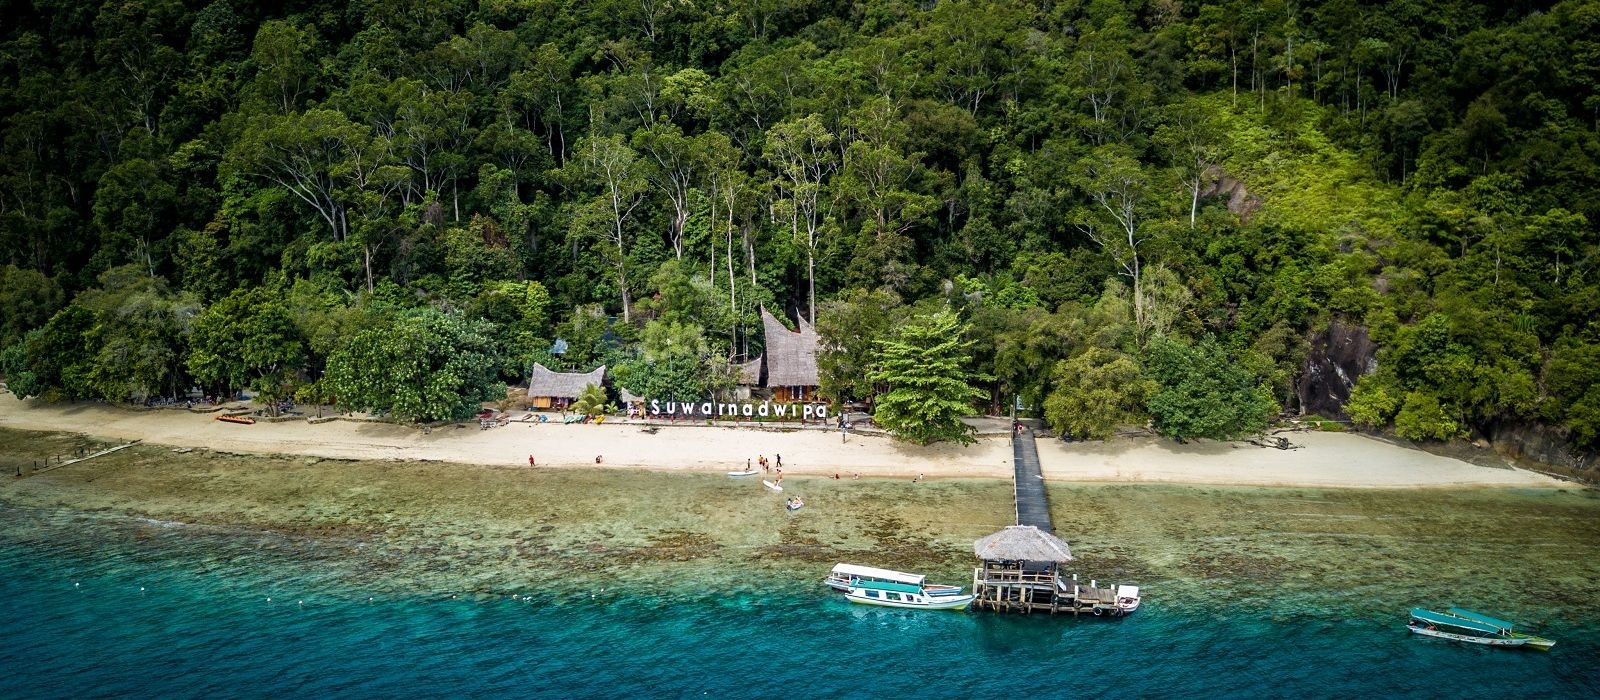 Best of Sulawesi and Sumatra Tour Trip 1